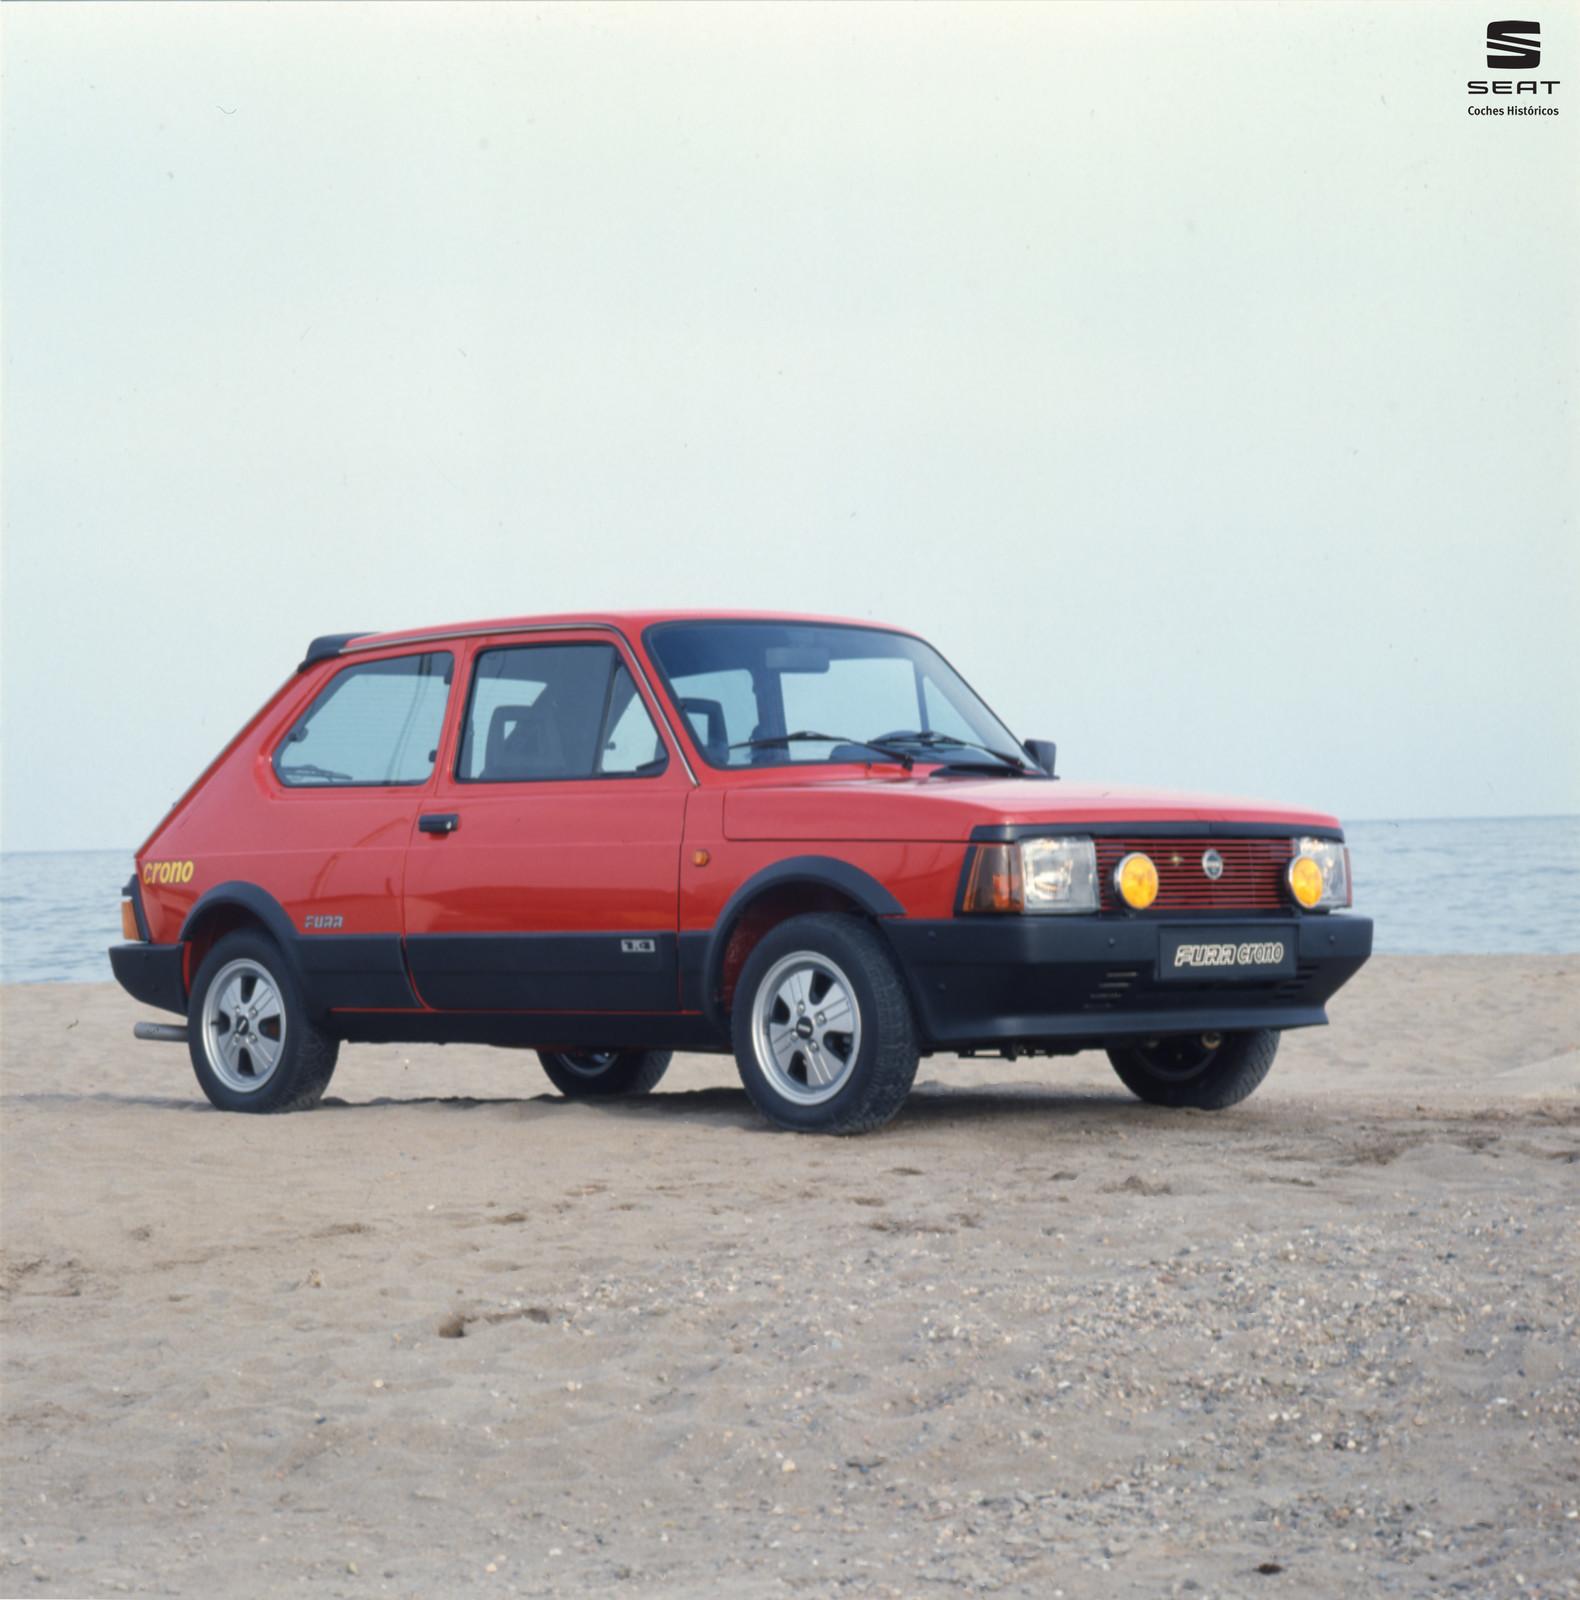 Foto de Motor SEAT 1430 - fotos históricas (43/49)